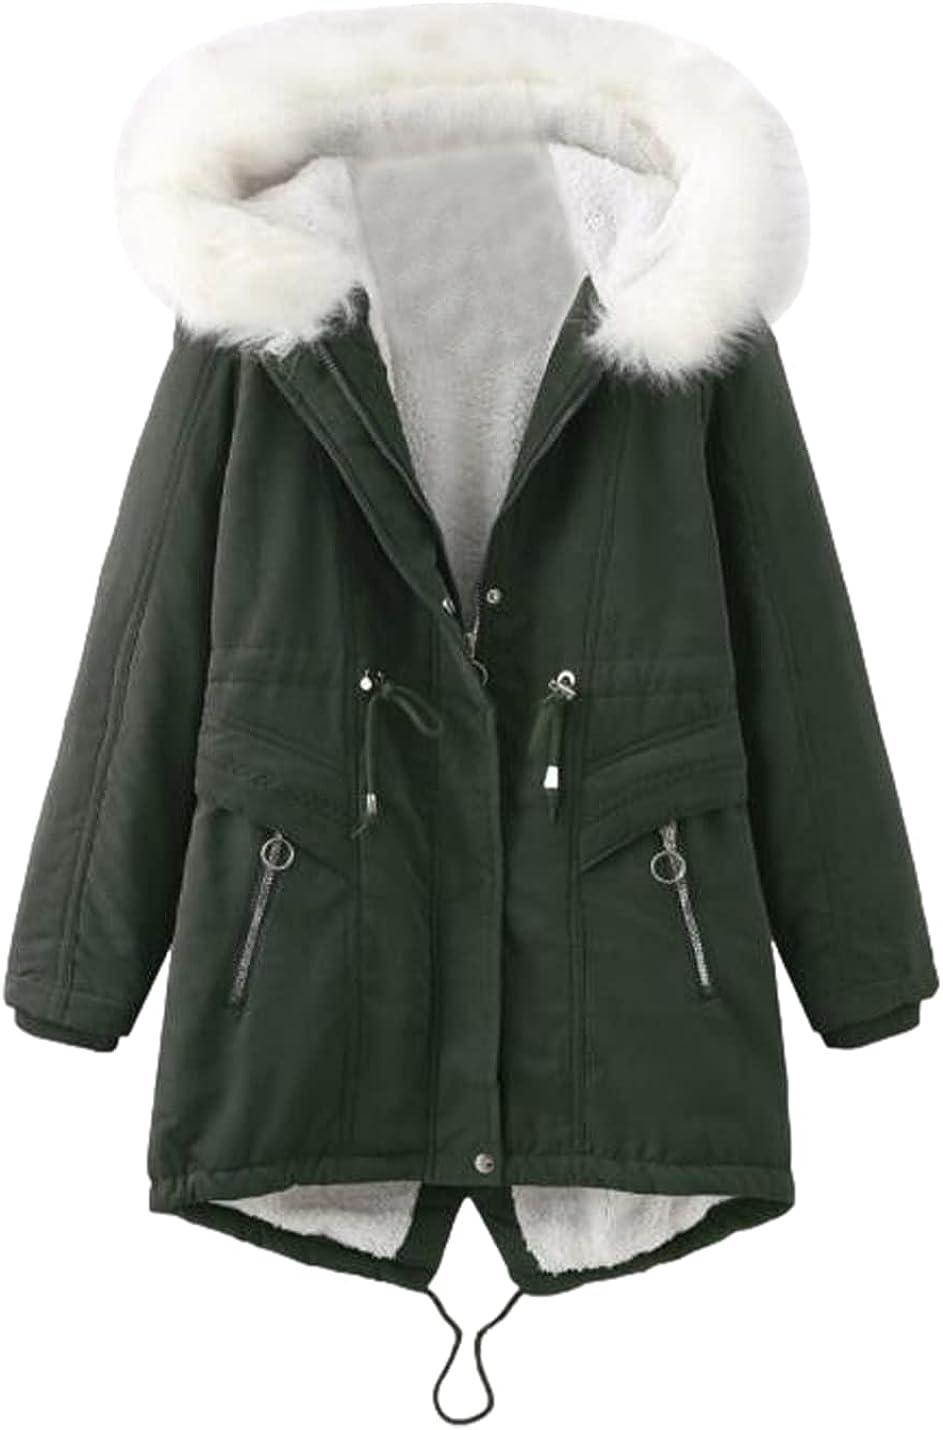 Xishiloft Women's Hooded Warm Winter Parka Jacket Long sleeve fur collar zipper Slim Lightweight Long Military Cargo Coat